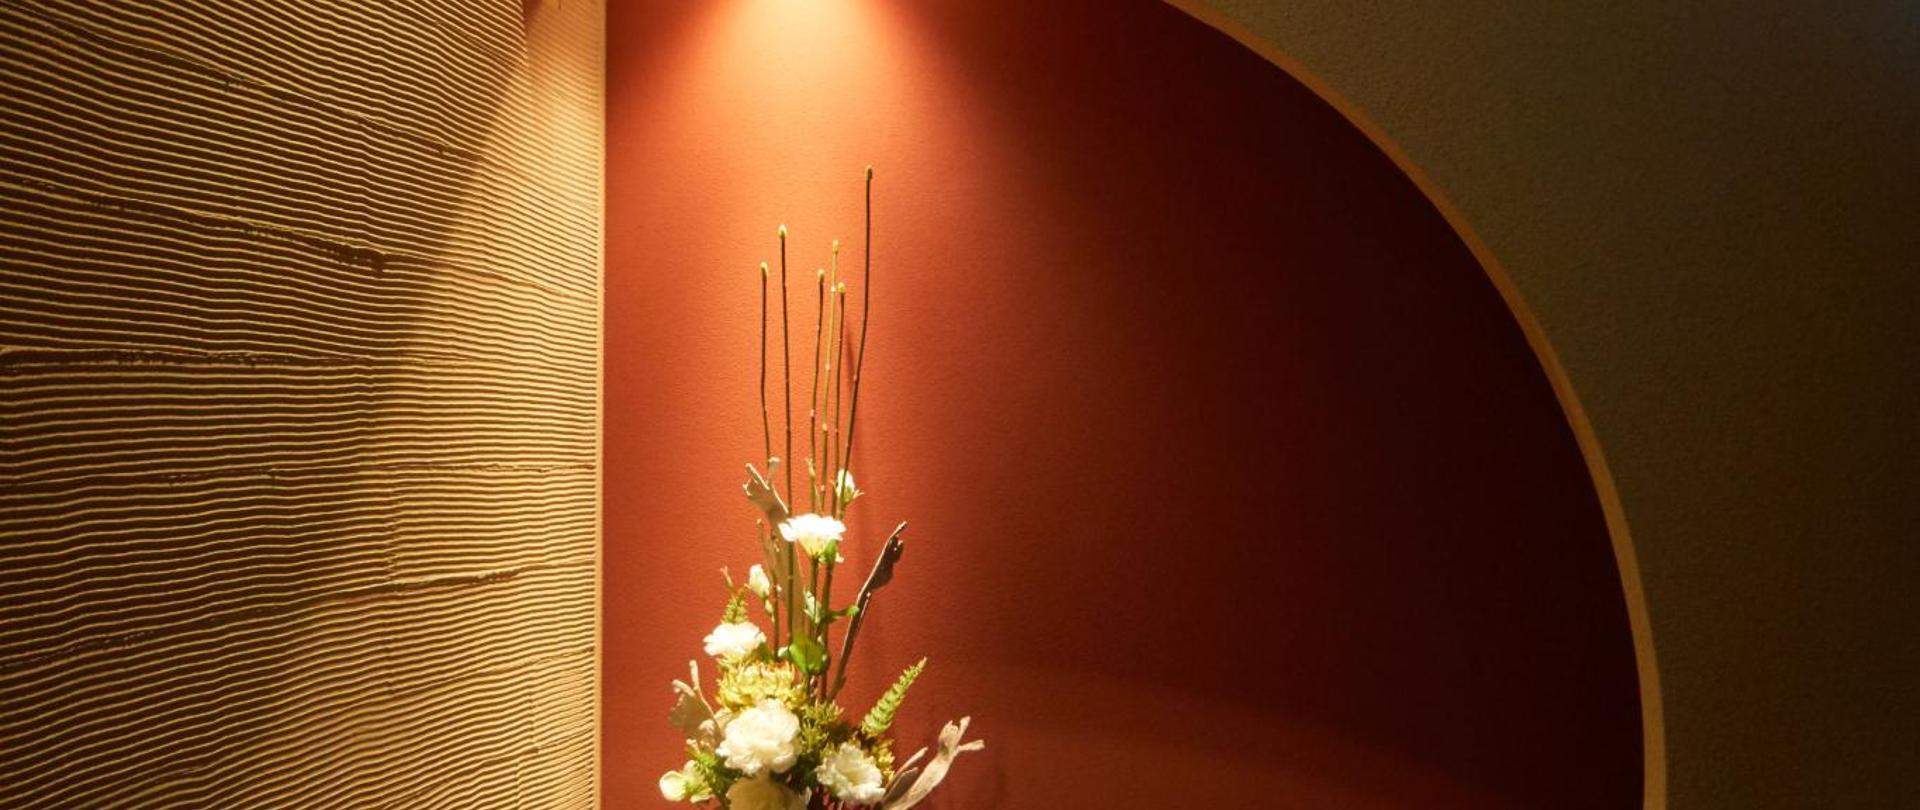 181217_HotelMondonce_361.jpg